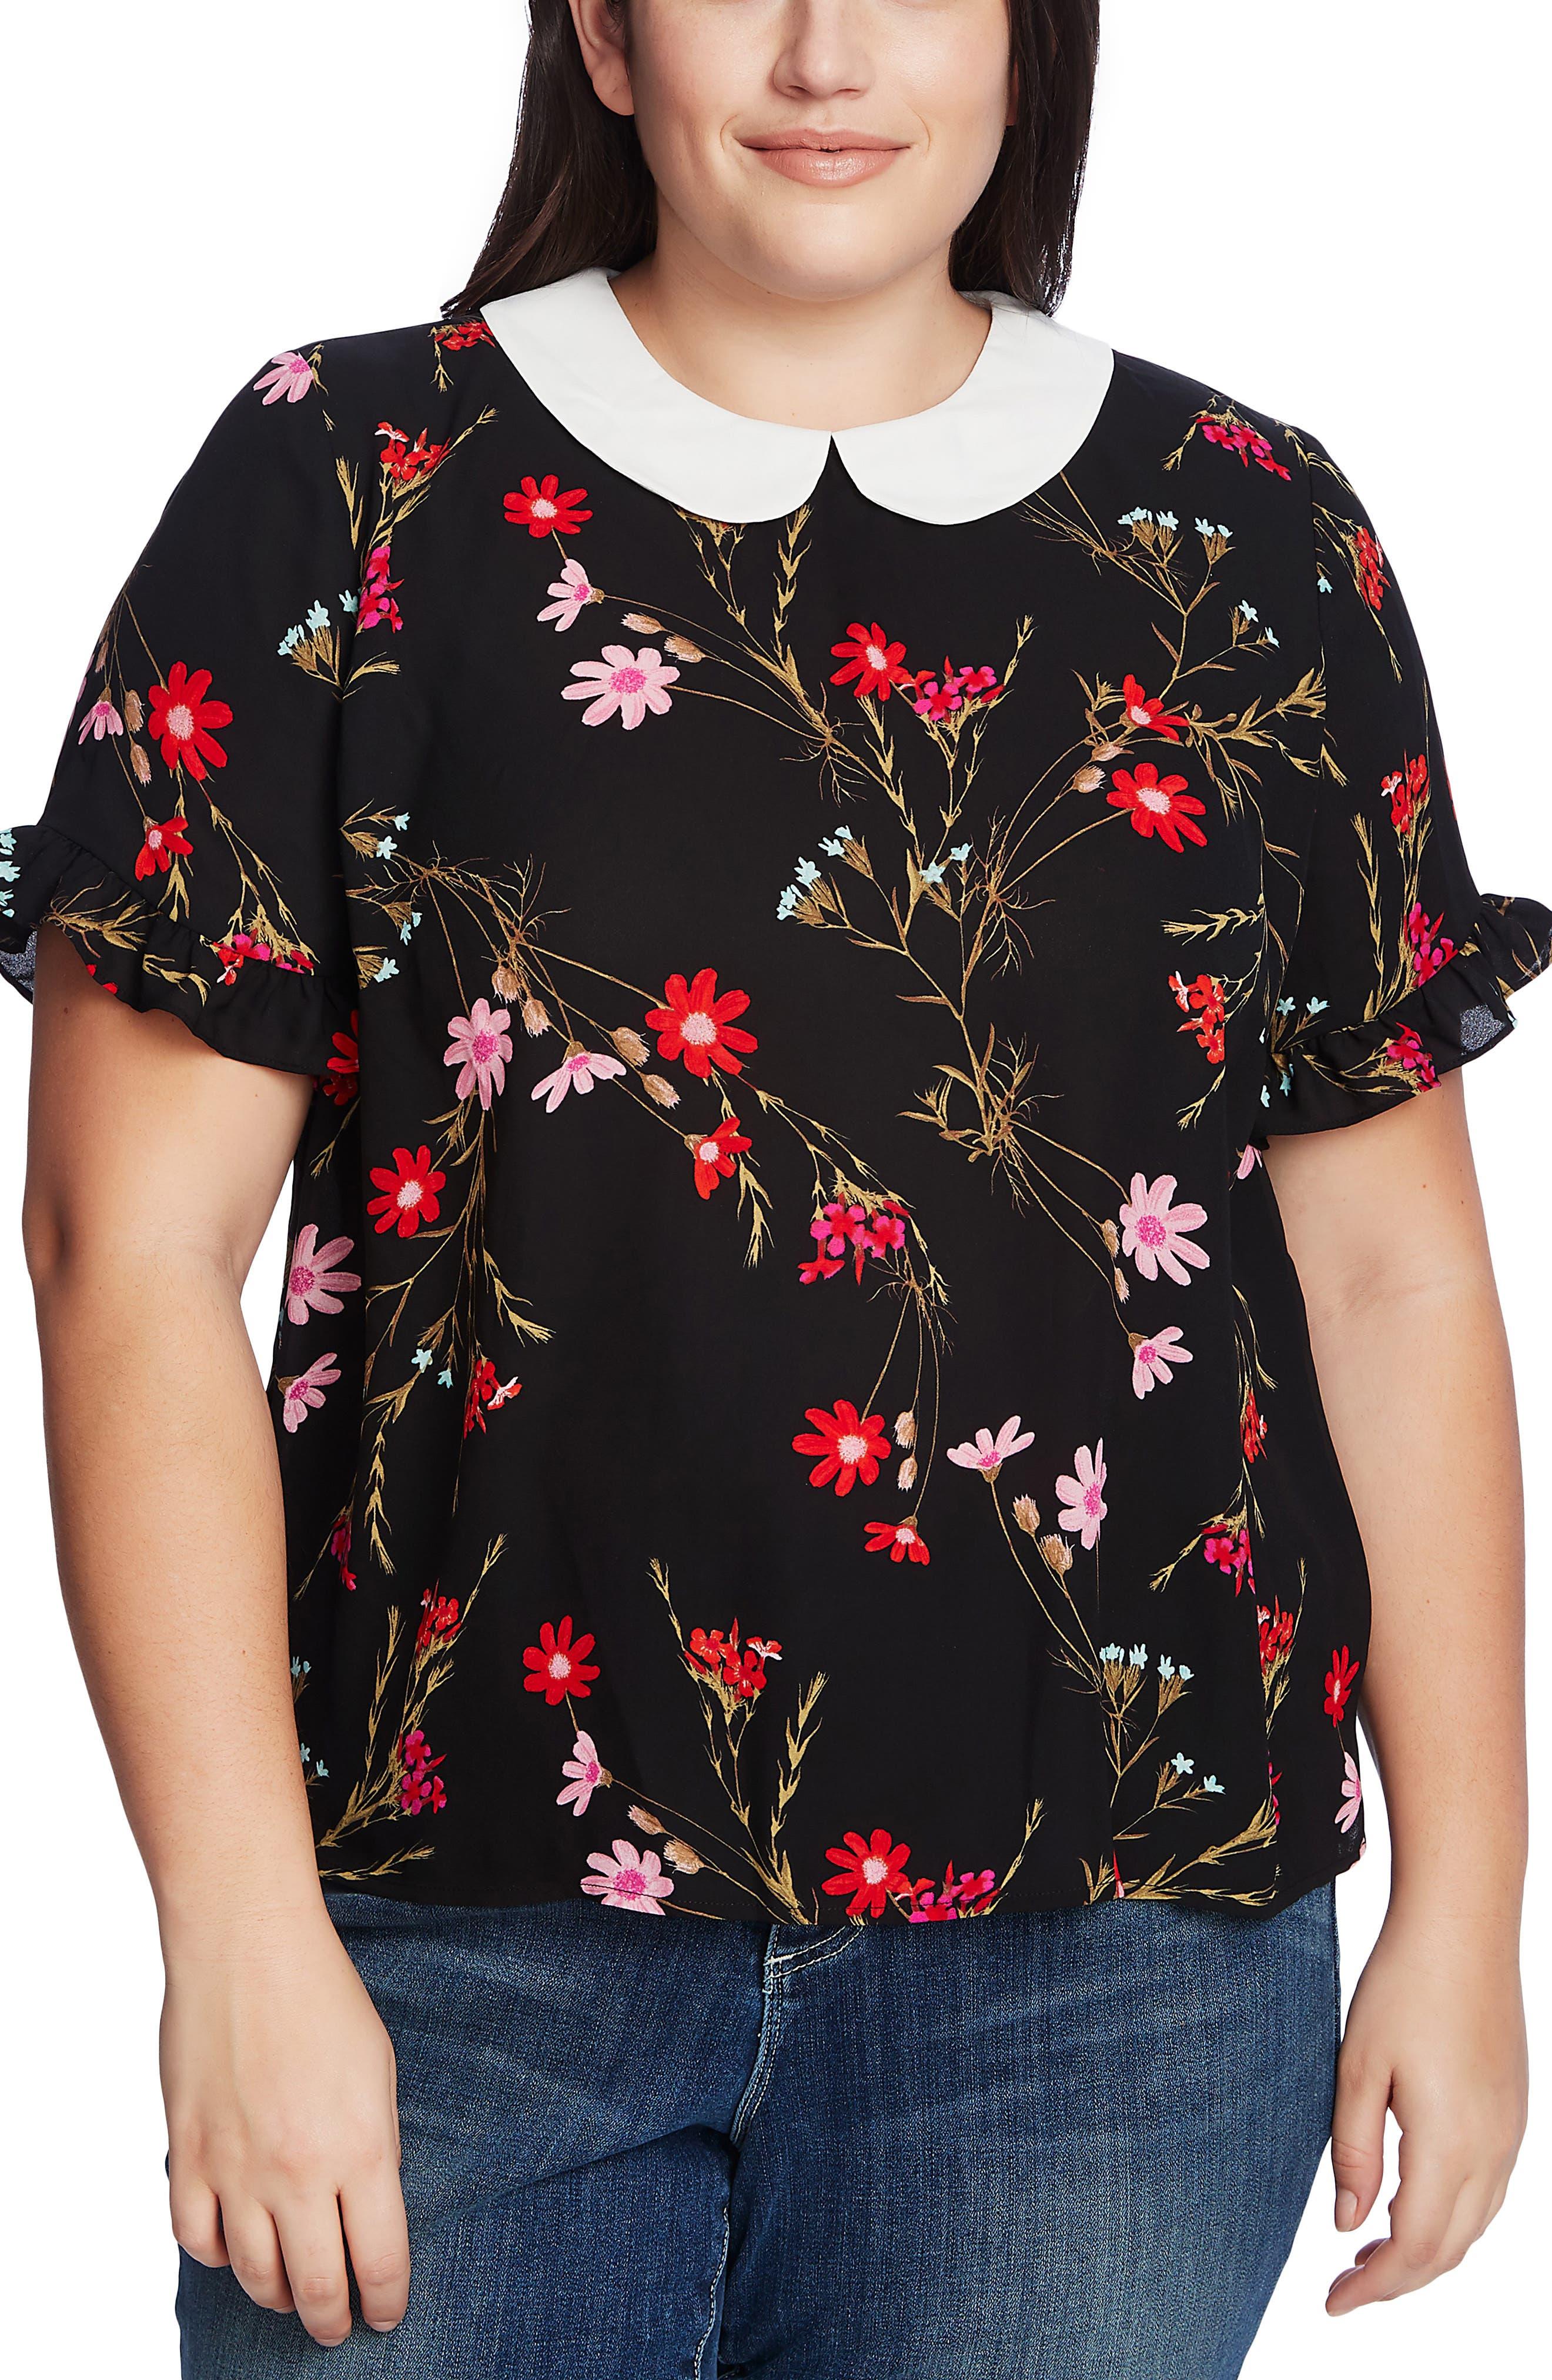 1930s Style Blouses, Shirts, Tops | Vintage Blouses Plus Size Womens Cece Enchanted Wildflower Collar Blouse $41.40 AT vintagedancer.com